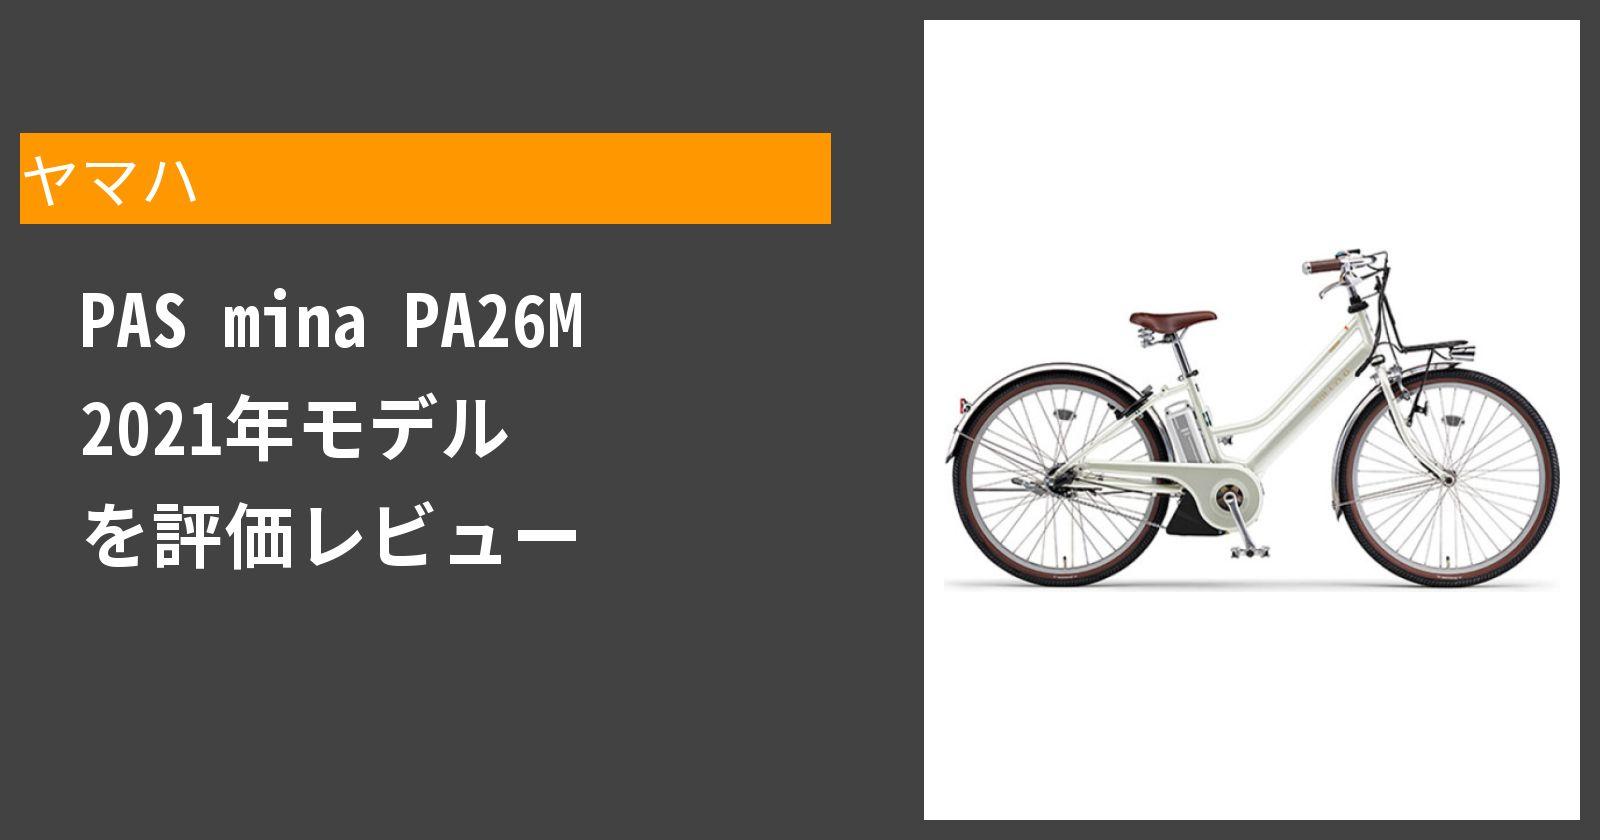 PAS mina PA26M 2021年モデルを徹底評価